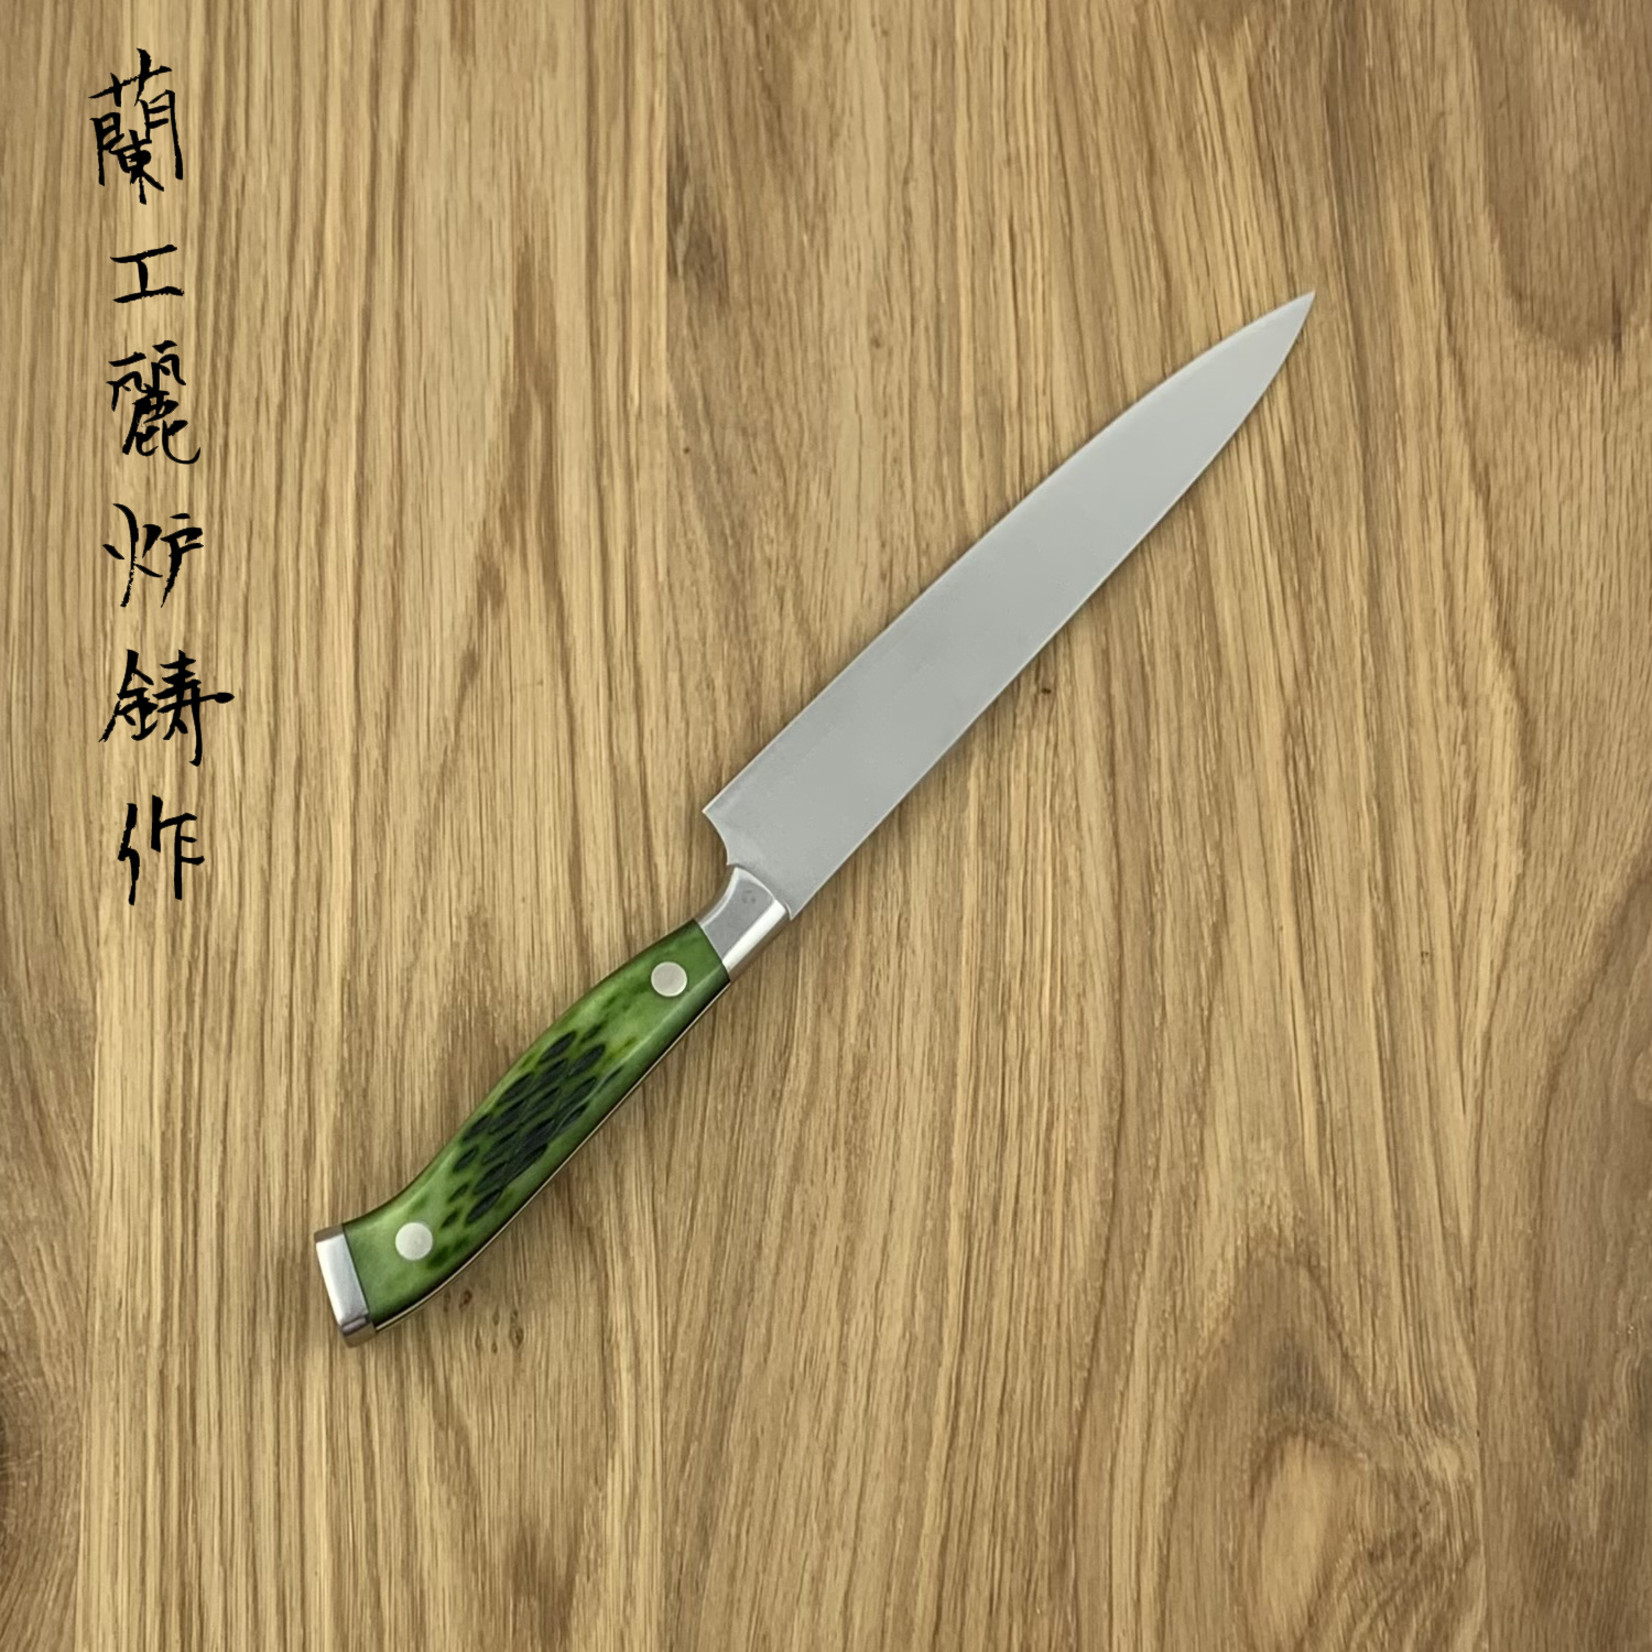 NENOHI NENOX Premium groen petty 150 mm